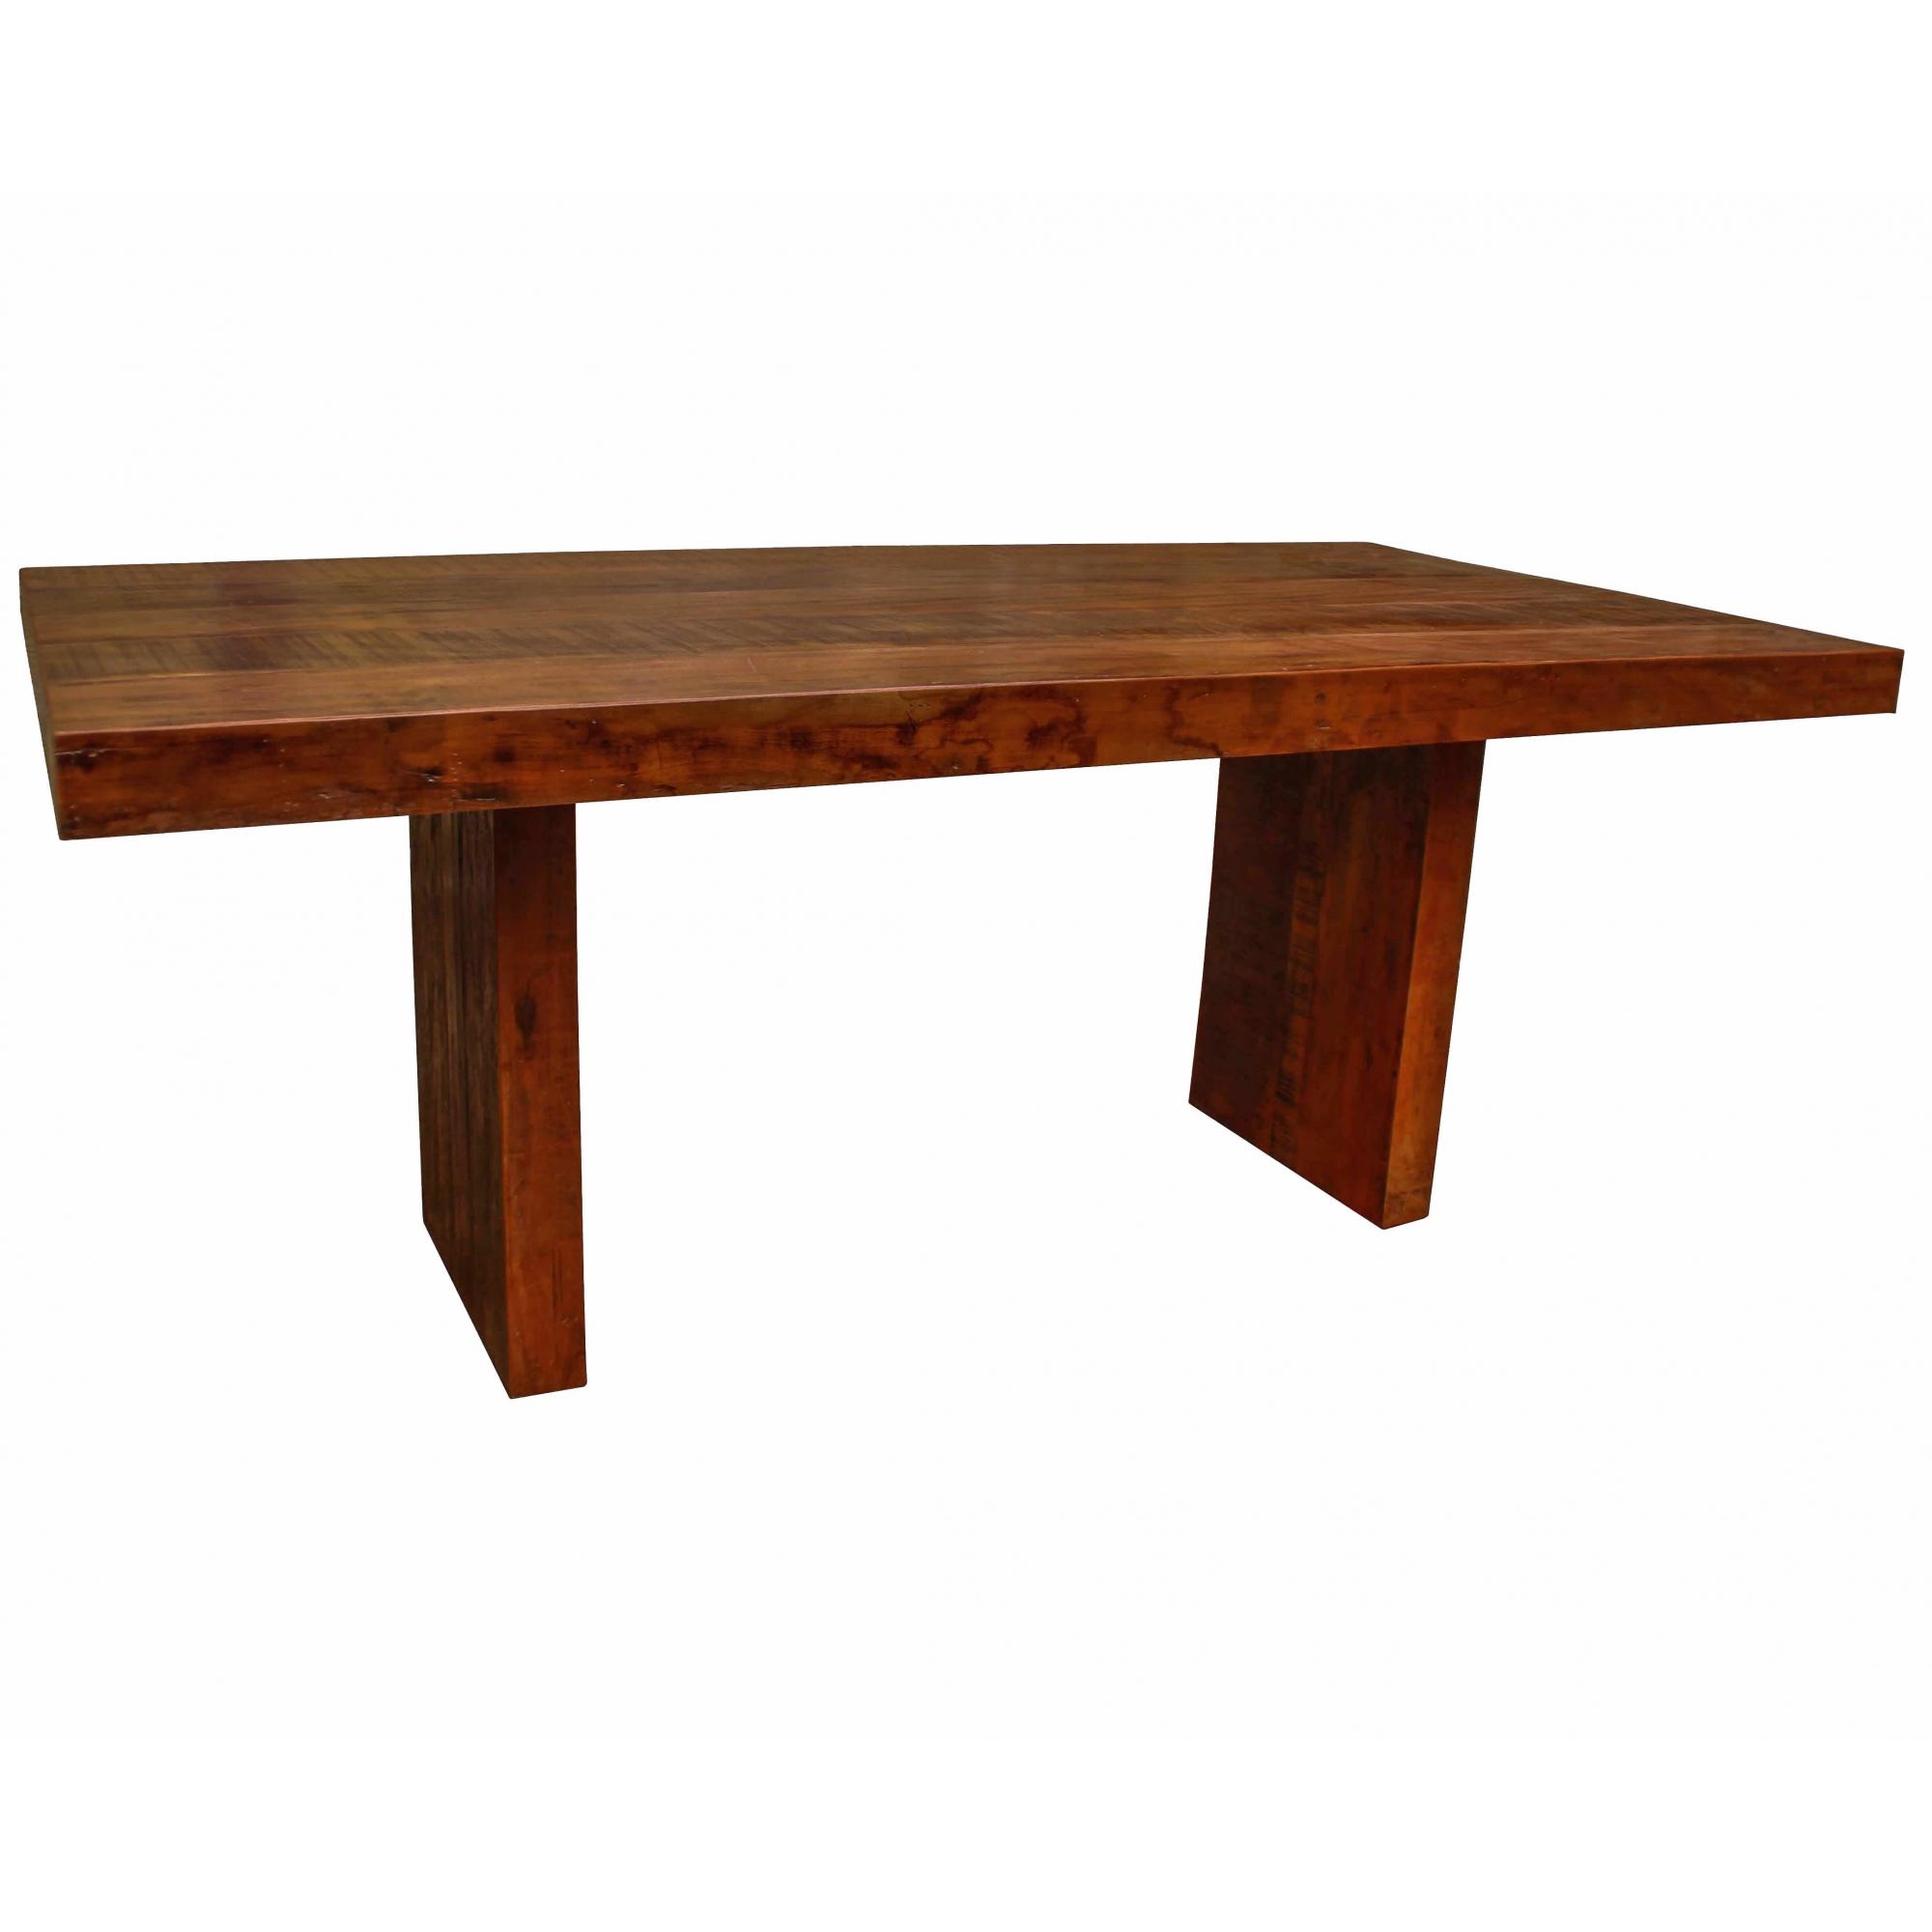 Mesa de Jantar Pés Recuados Madeira Rustica 2,00x 1,00 X 0,78